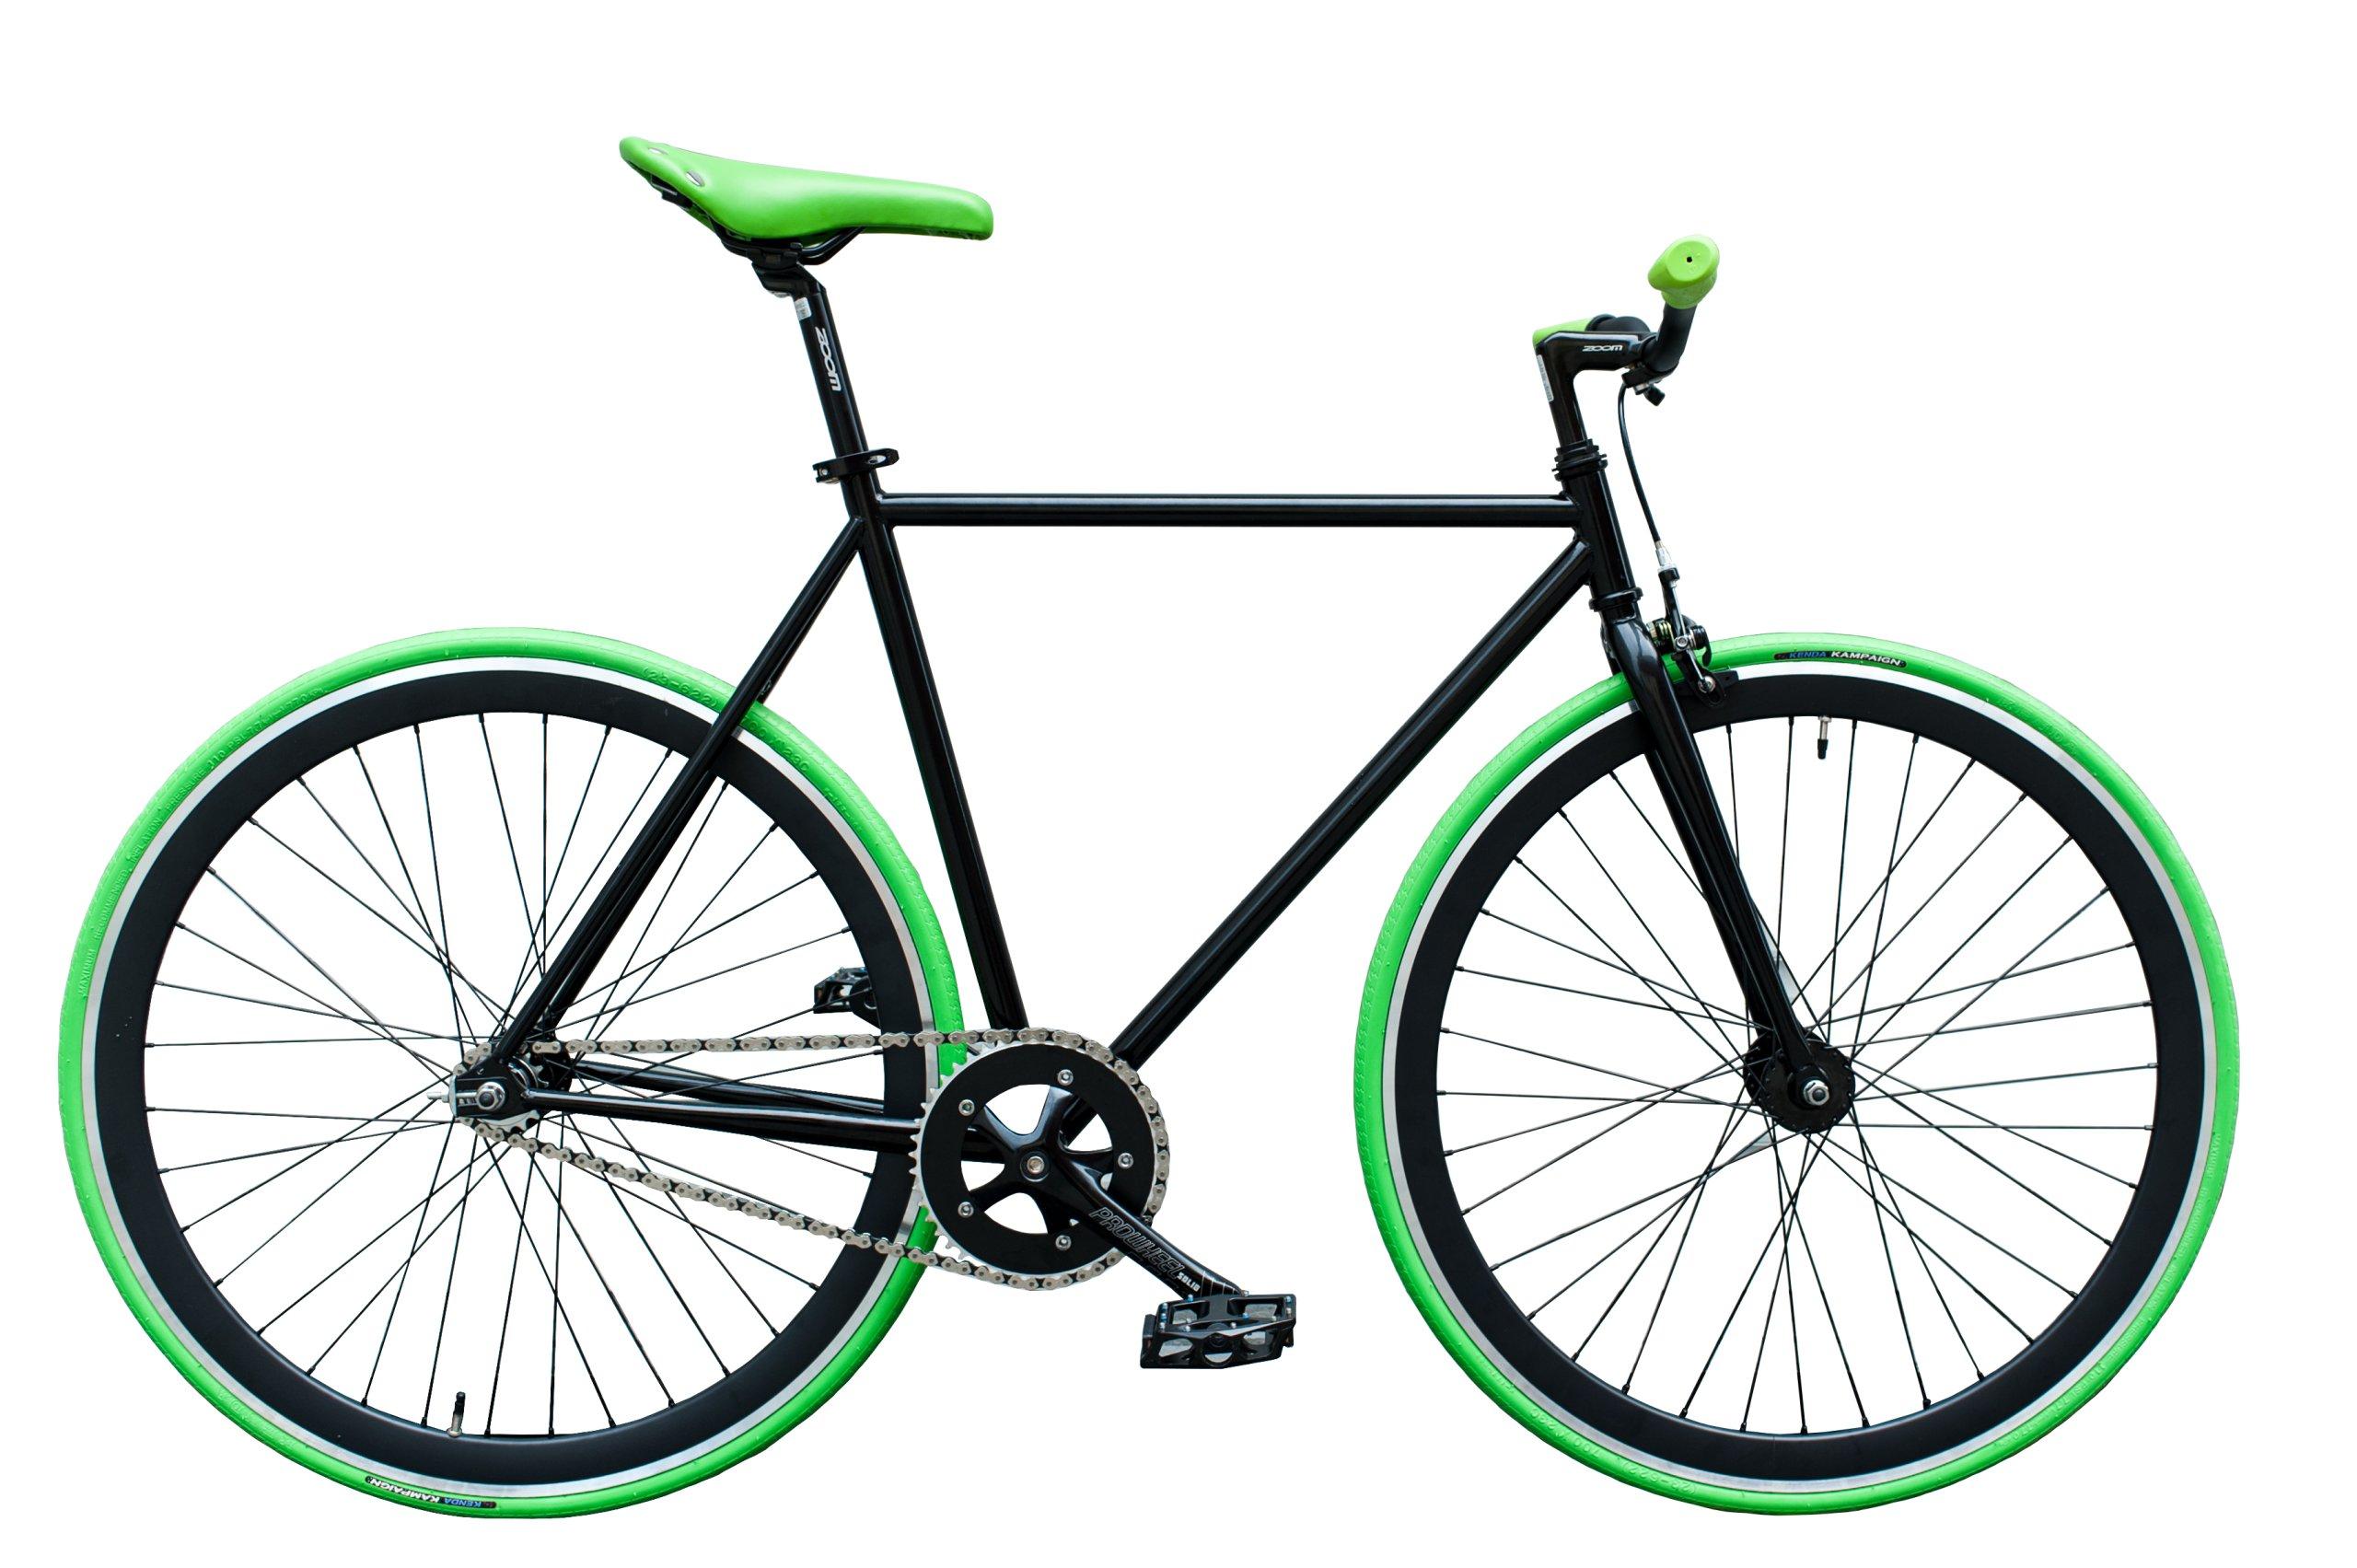 Woo Hoo bicykli Bicykle - ZELENÁ, Ostré Koleso 19''